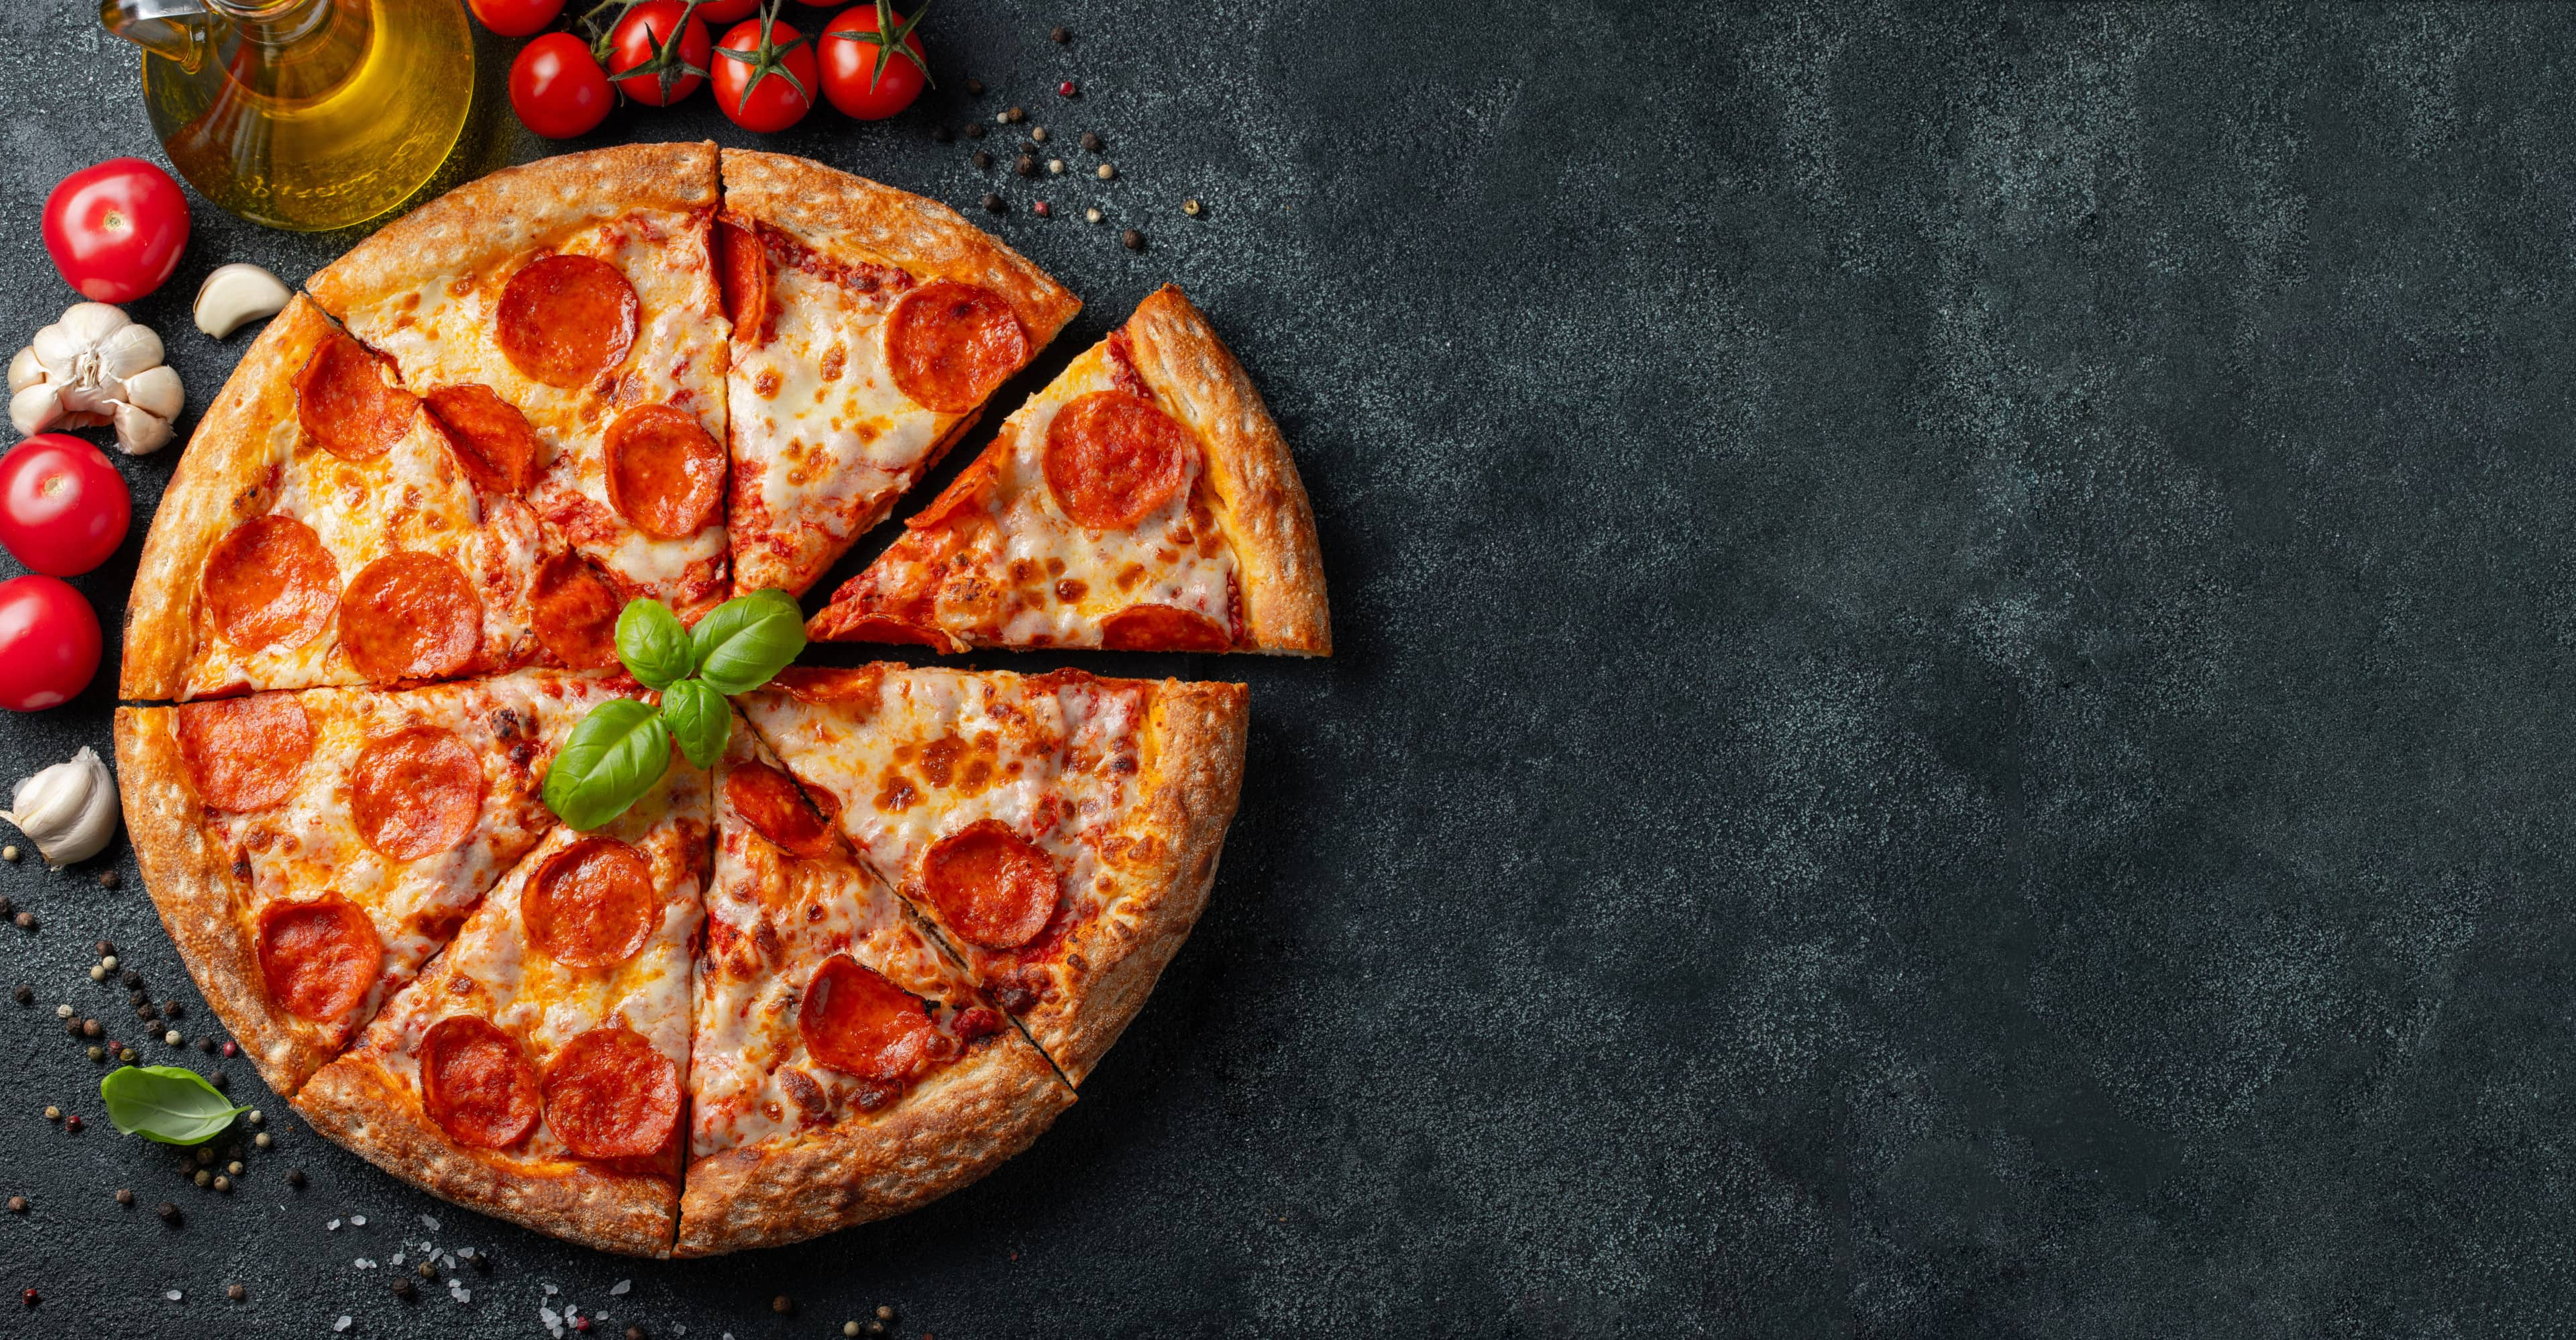 Pepperoni pizza on black background